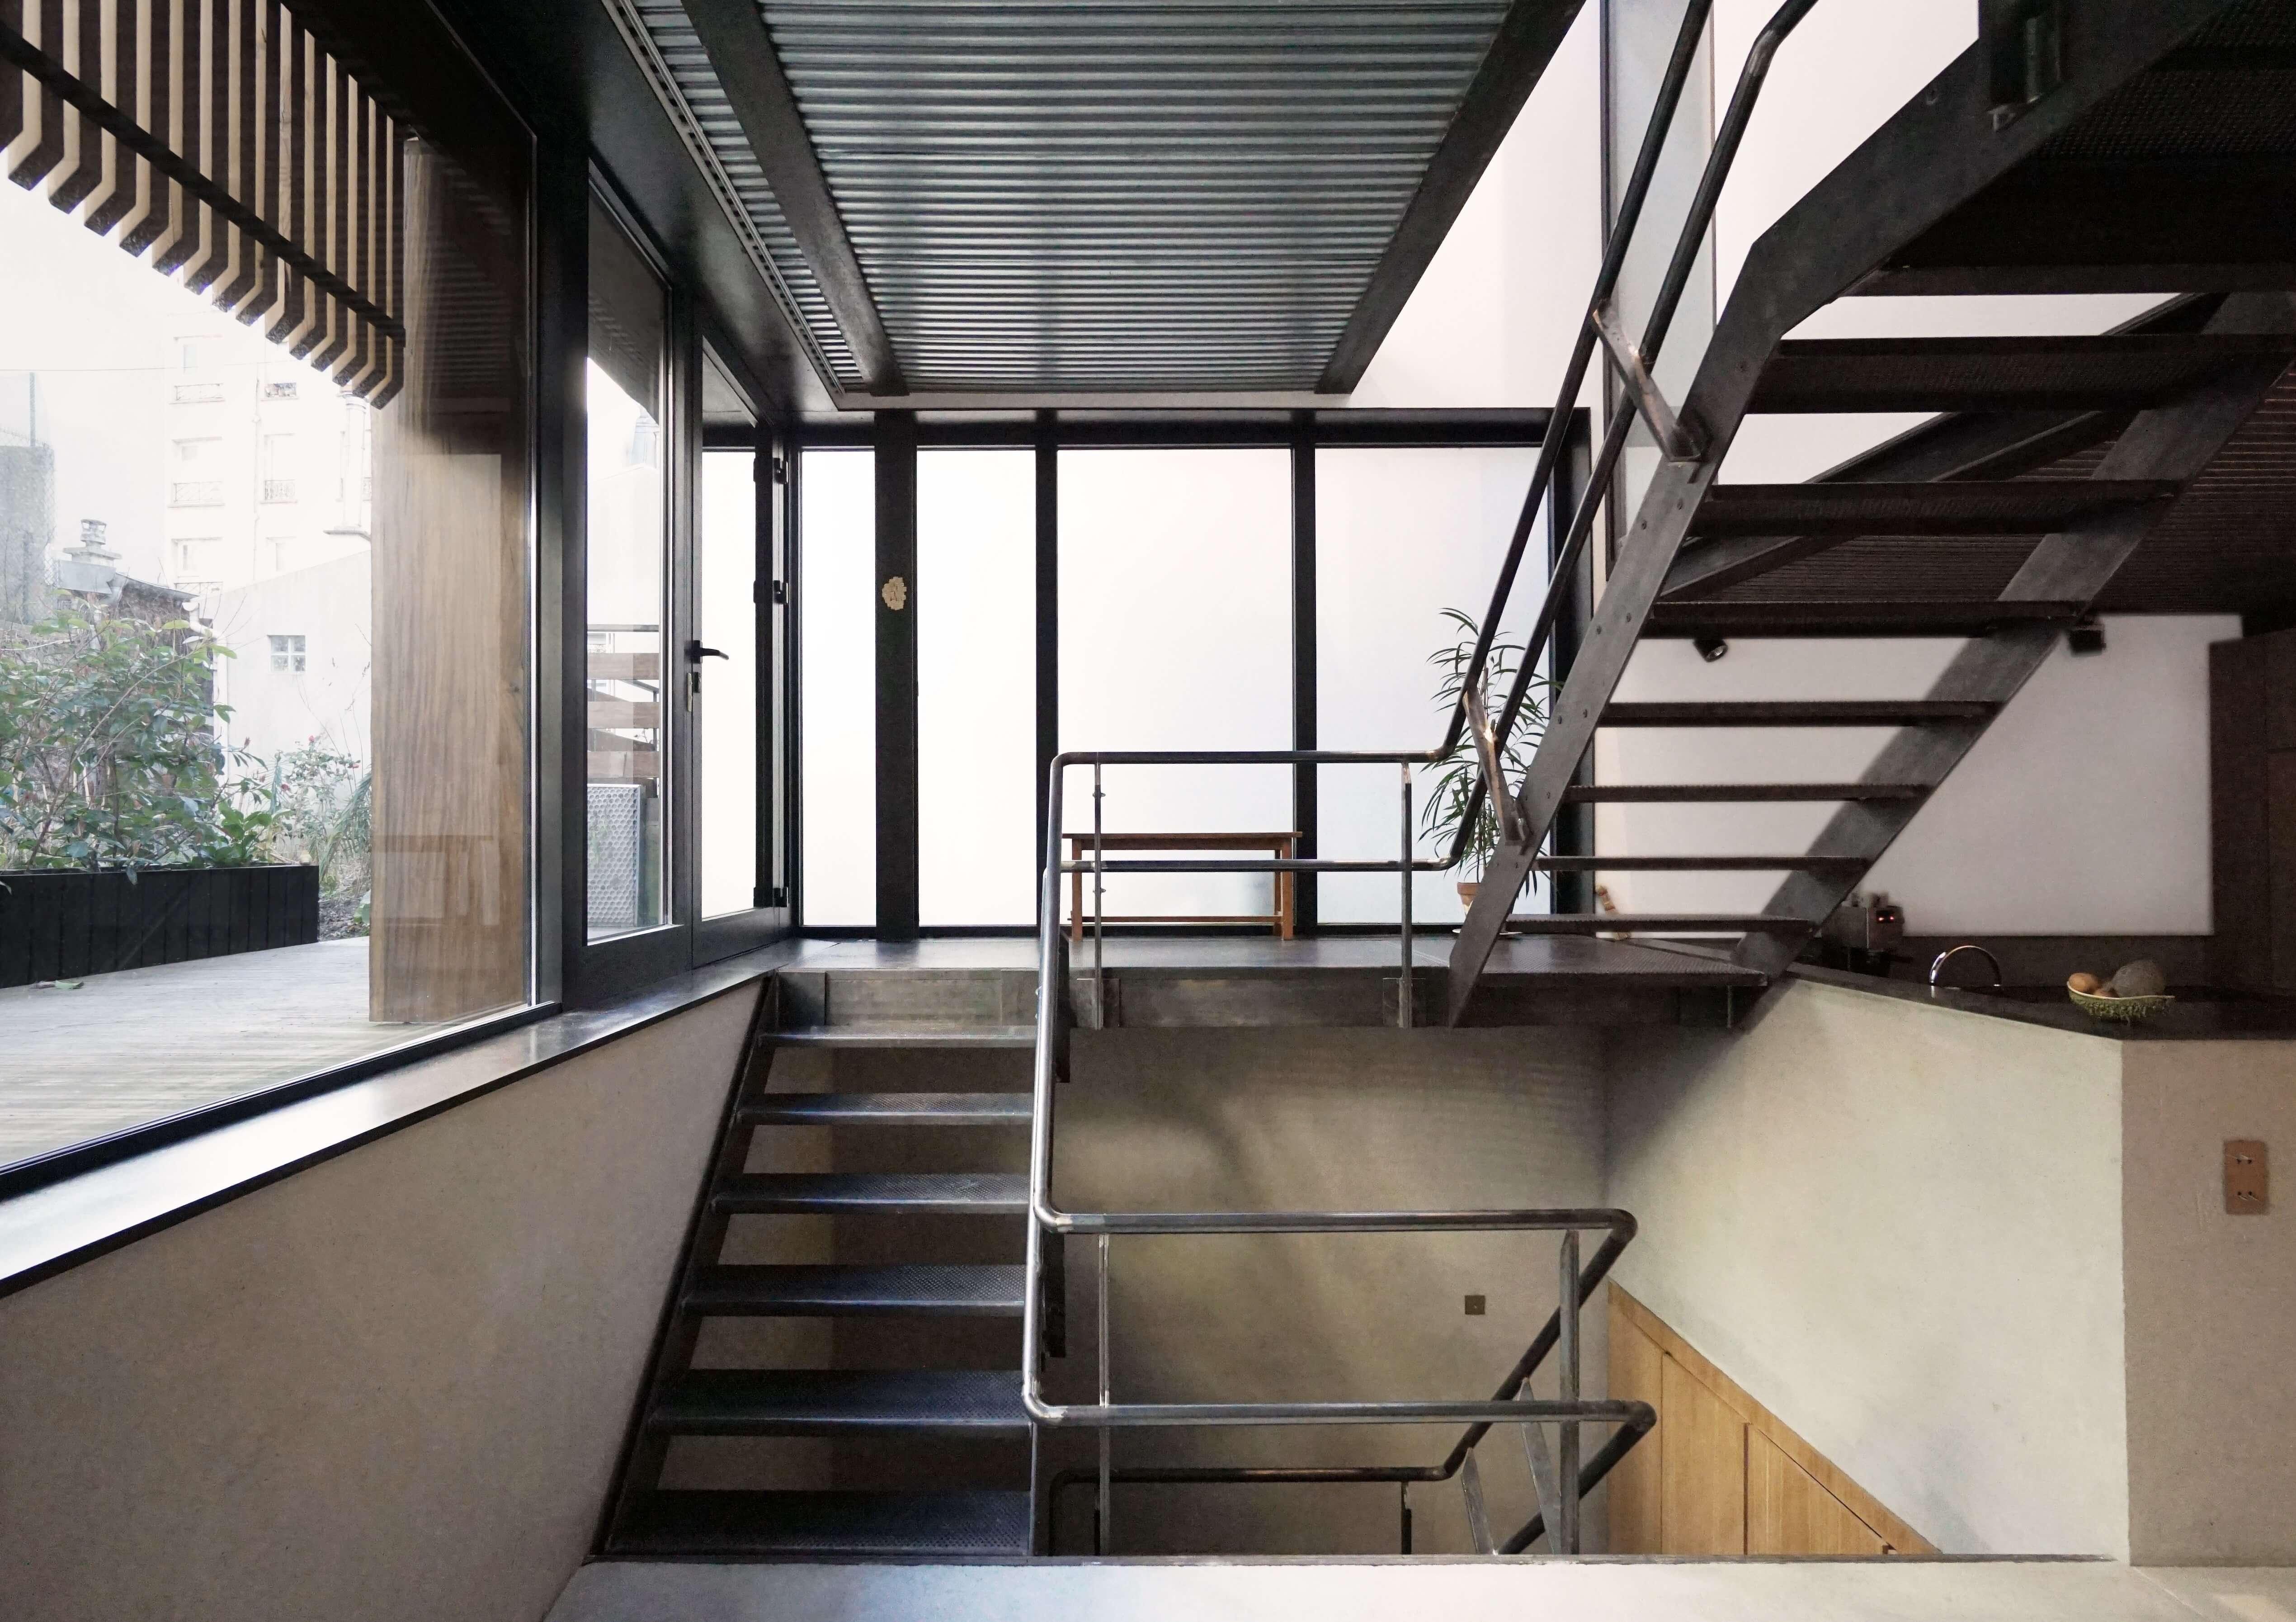 escalier transparent tournant